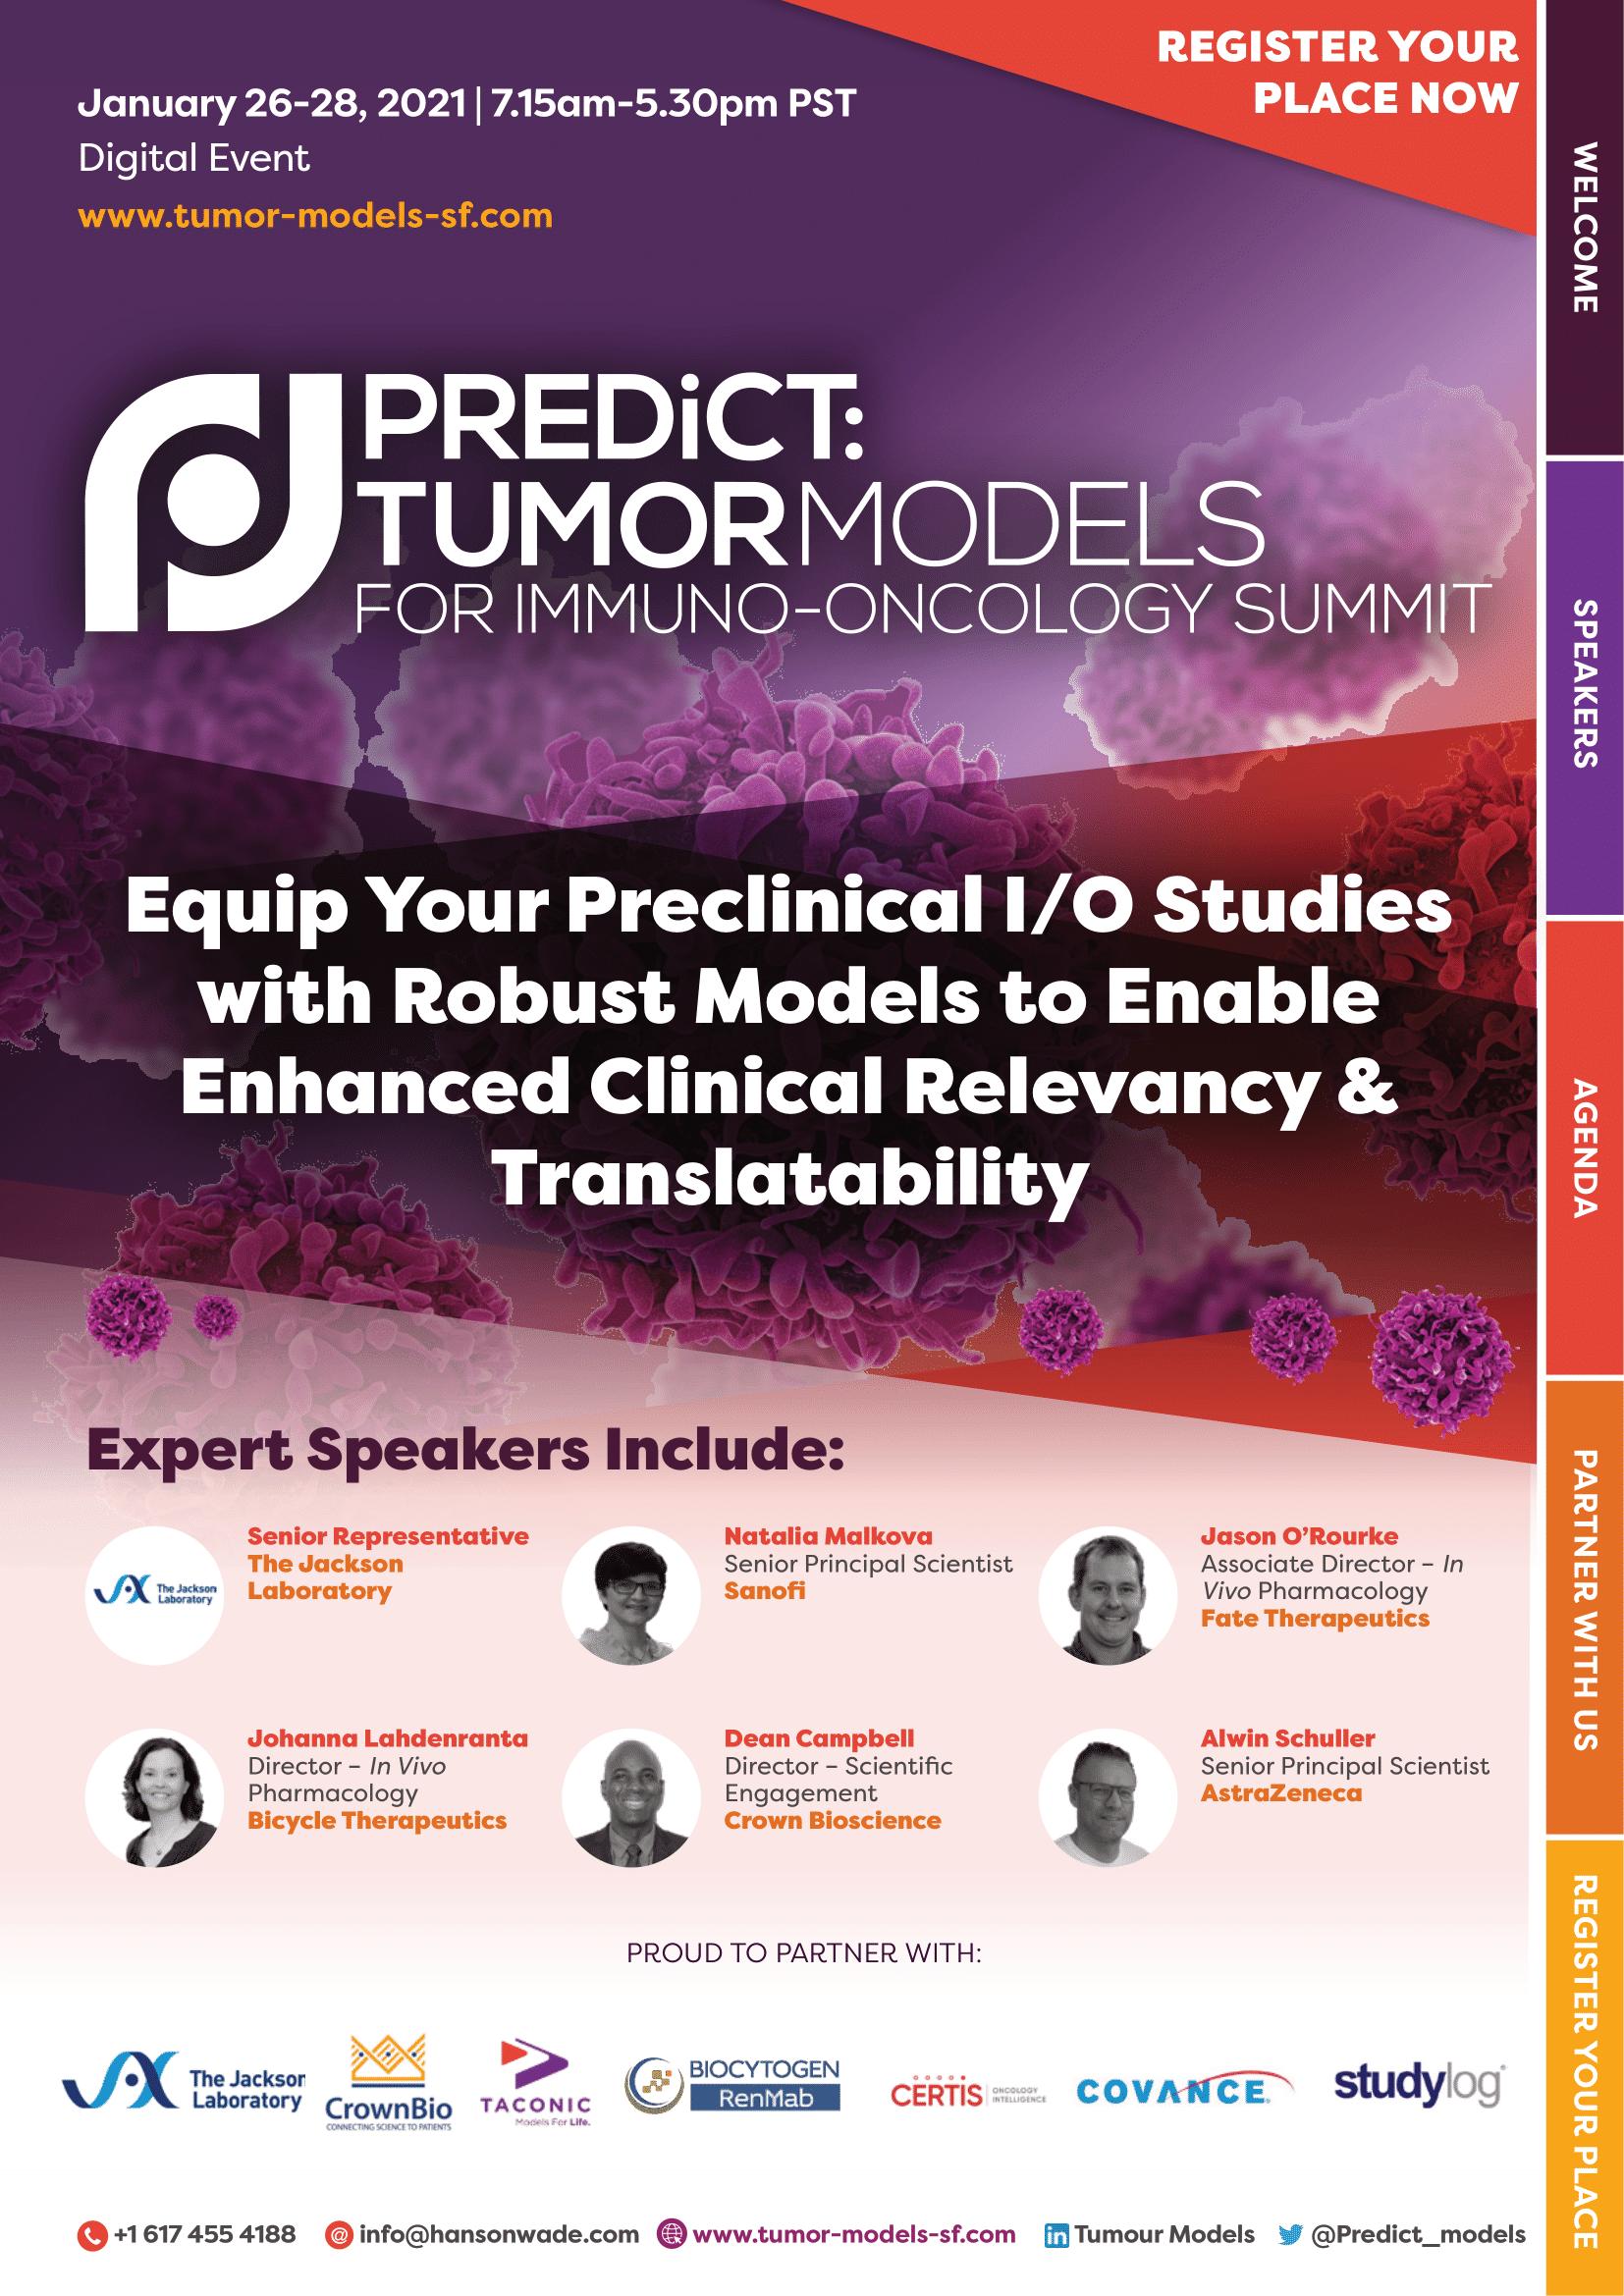 Official Program - Tumor Models for Immuno-Oncology Summit-01